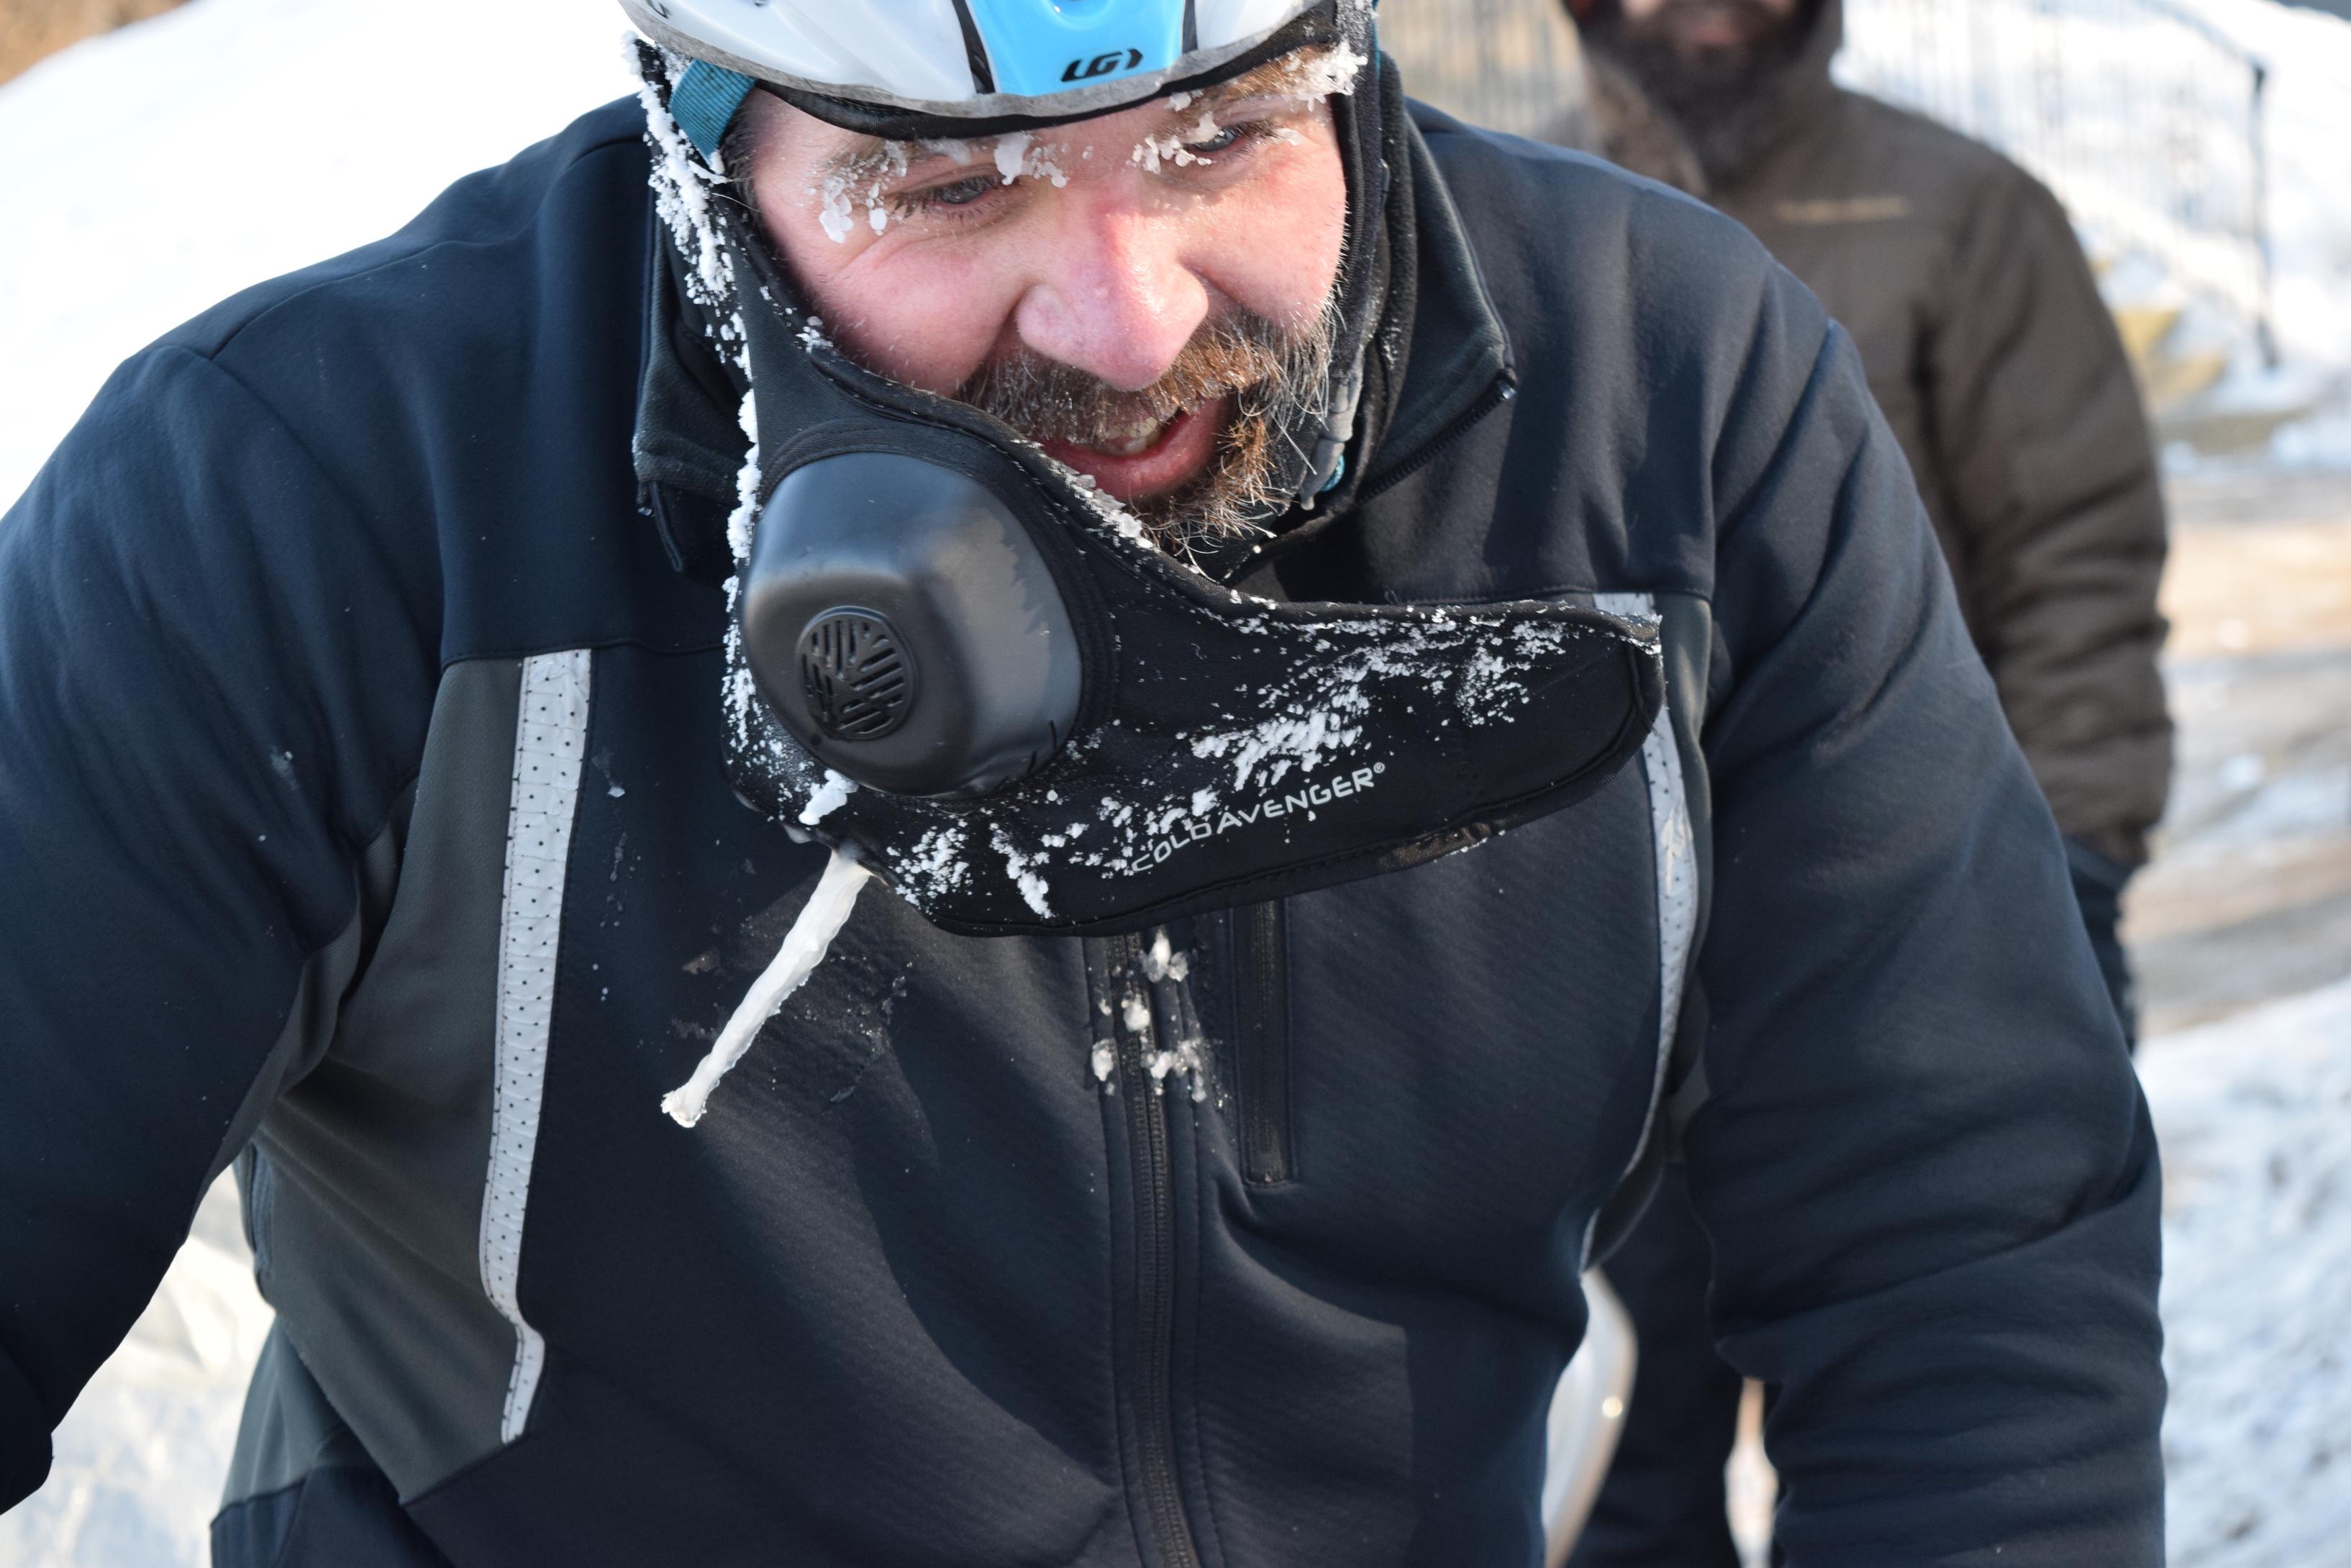 4th Annual Snow Bomb Fat Bike Race Amp Chili Cook Off